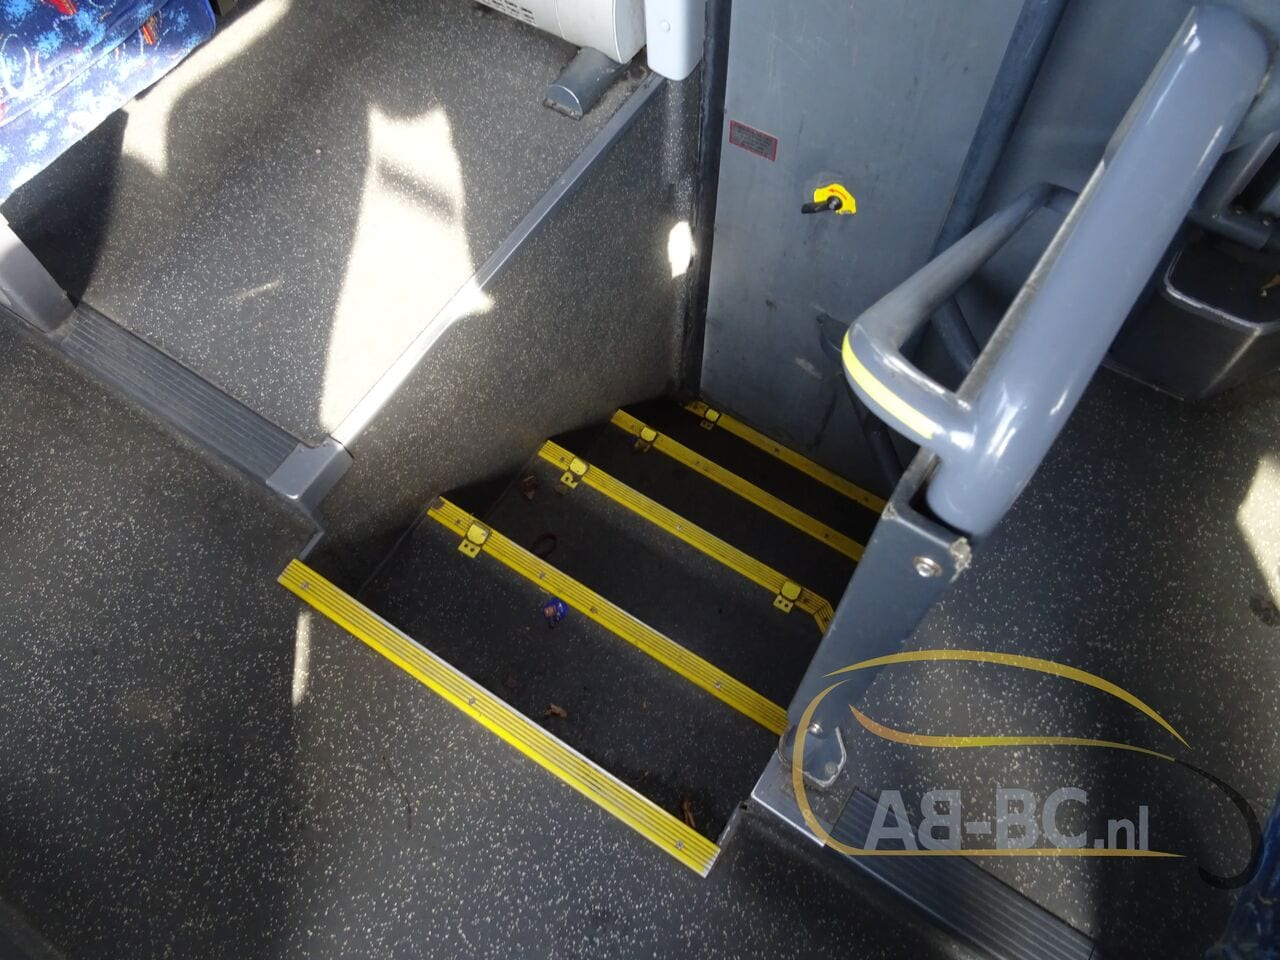 coach-busTEMSA-Safari-RD-65-Seats---1620312062448341909_big_bbe5cce91c0ca8159e0b636f565b2551--21050617272795316700